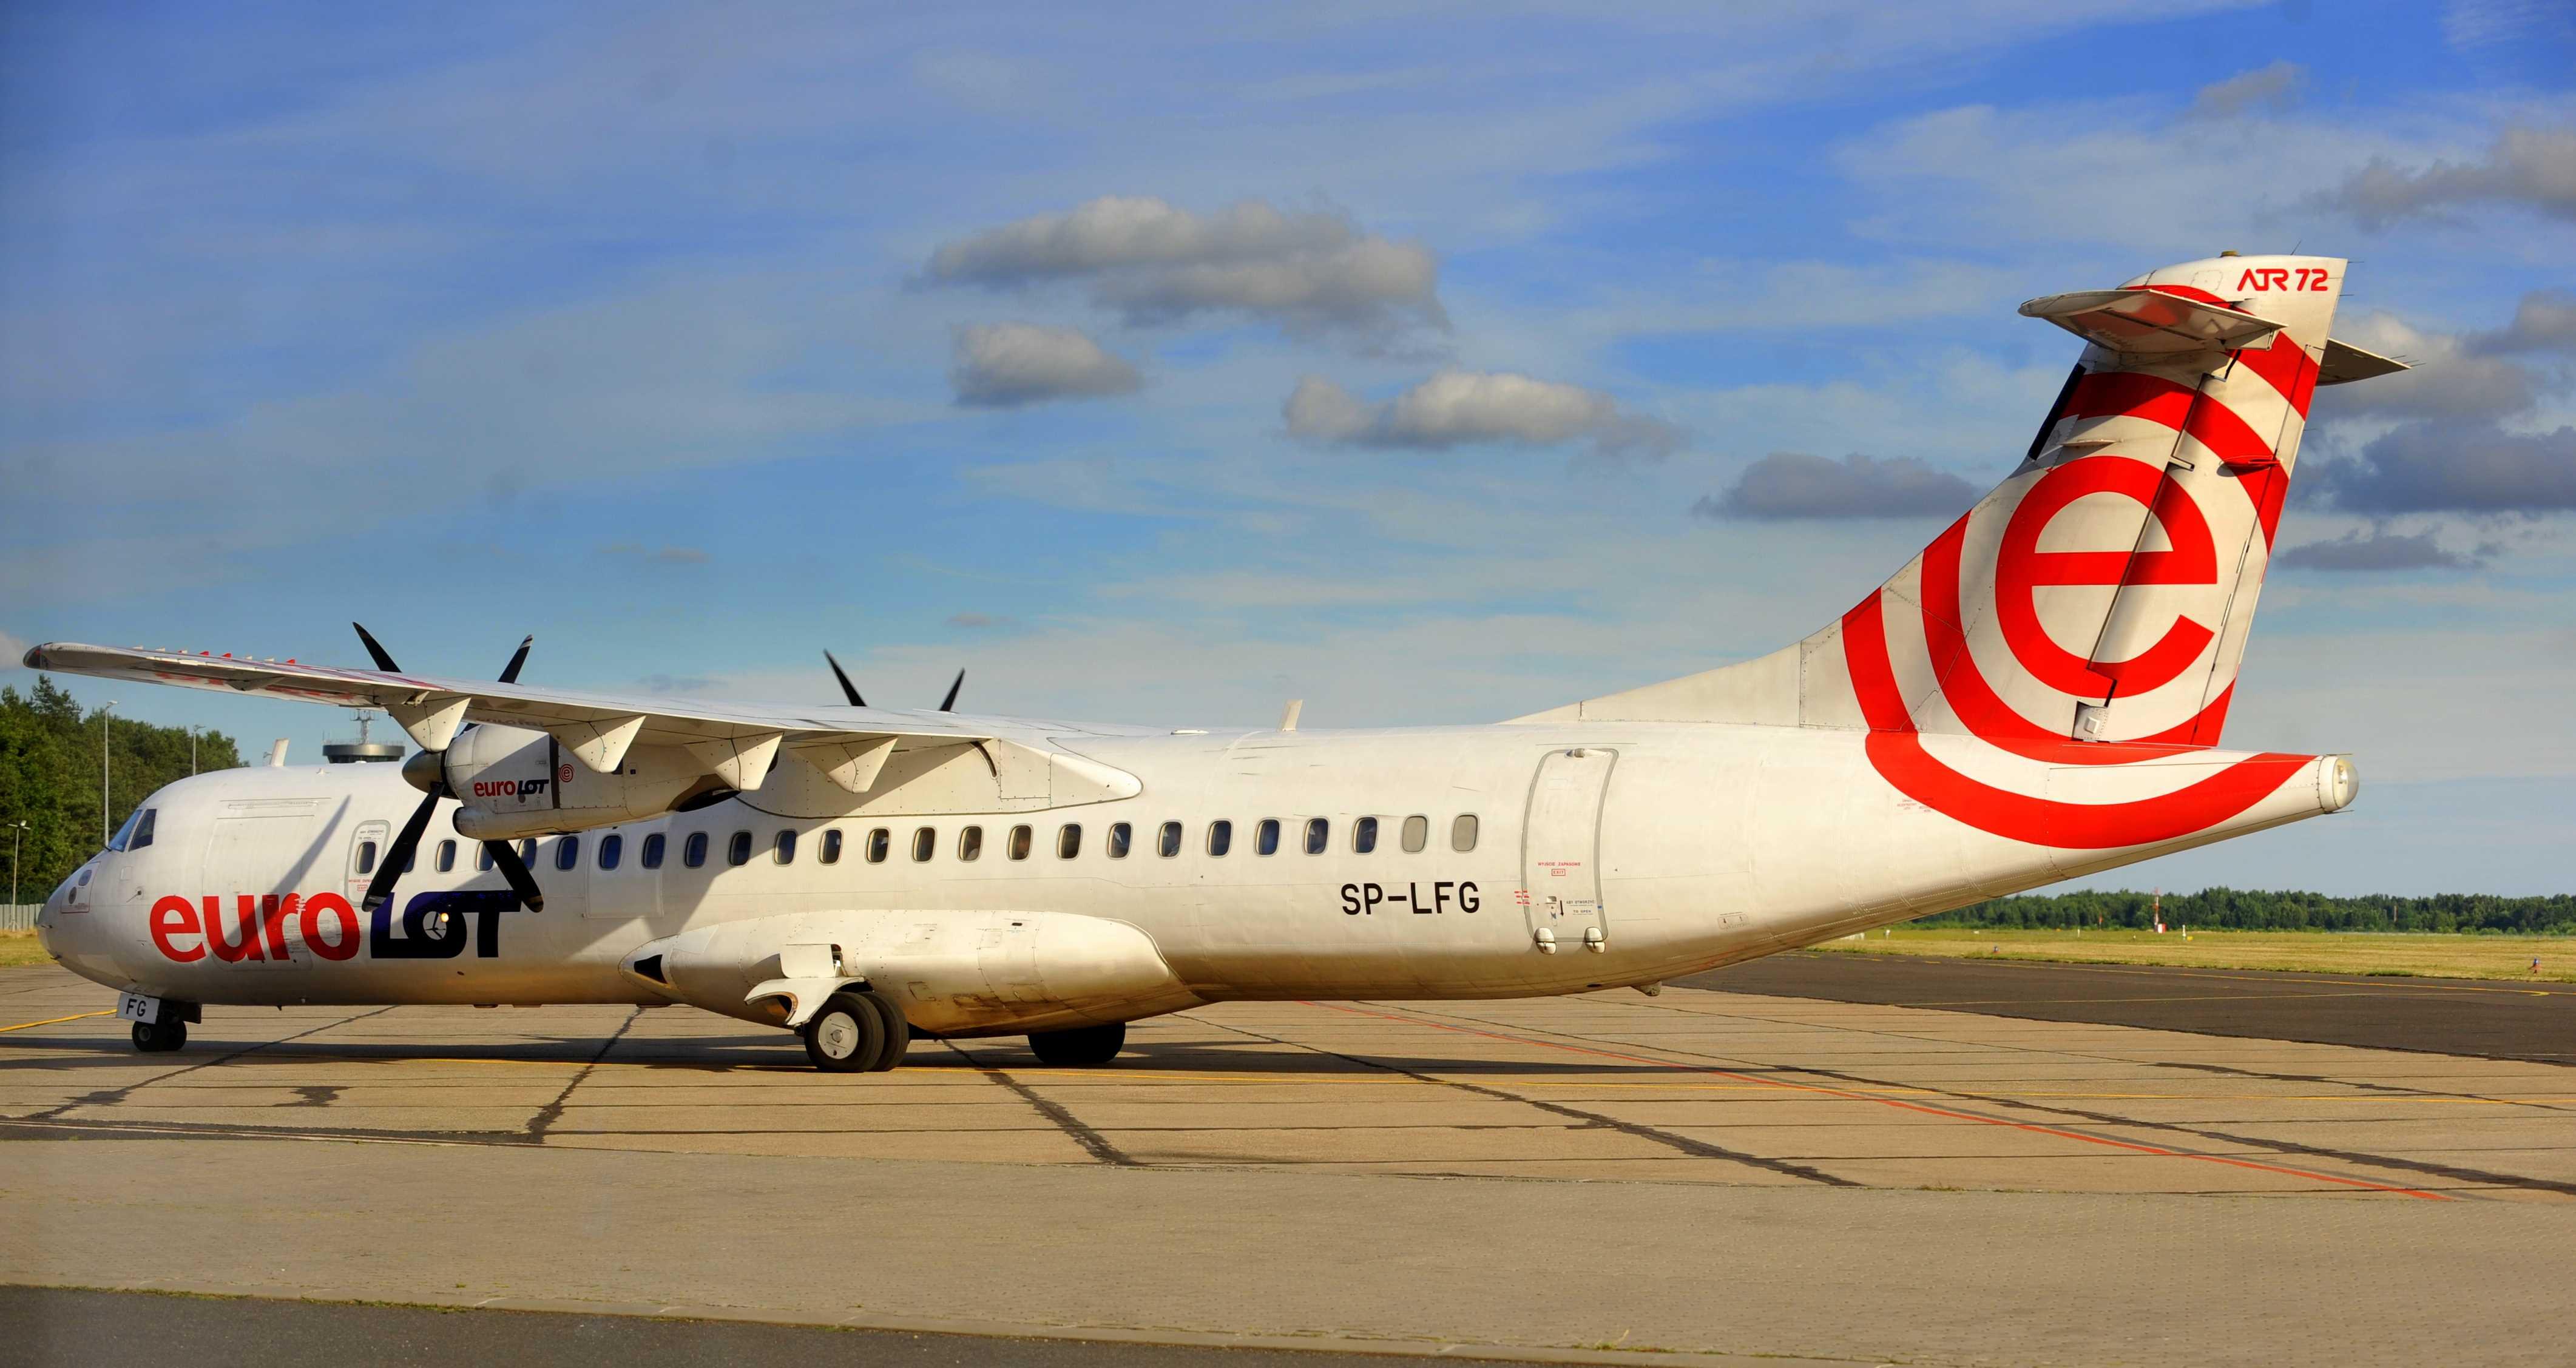 Авиакомпания евролот (eurolot) - авиабилеты